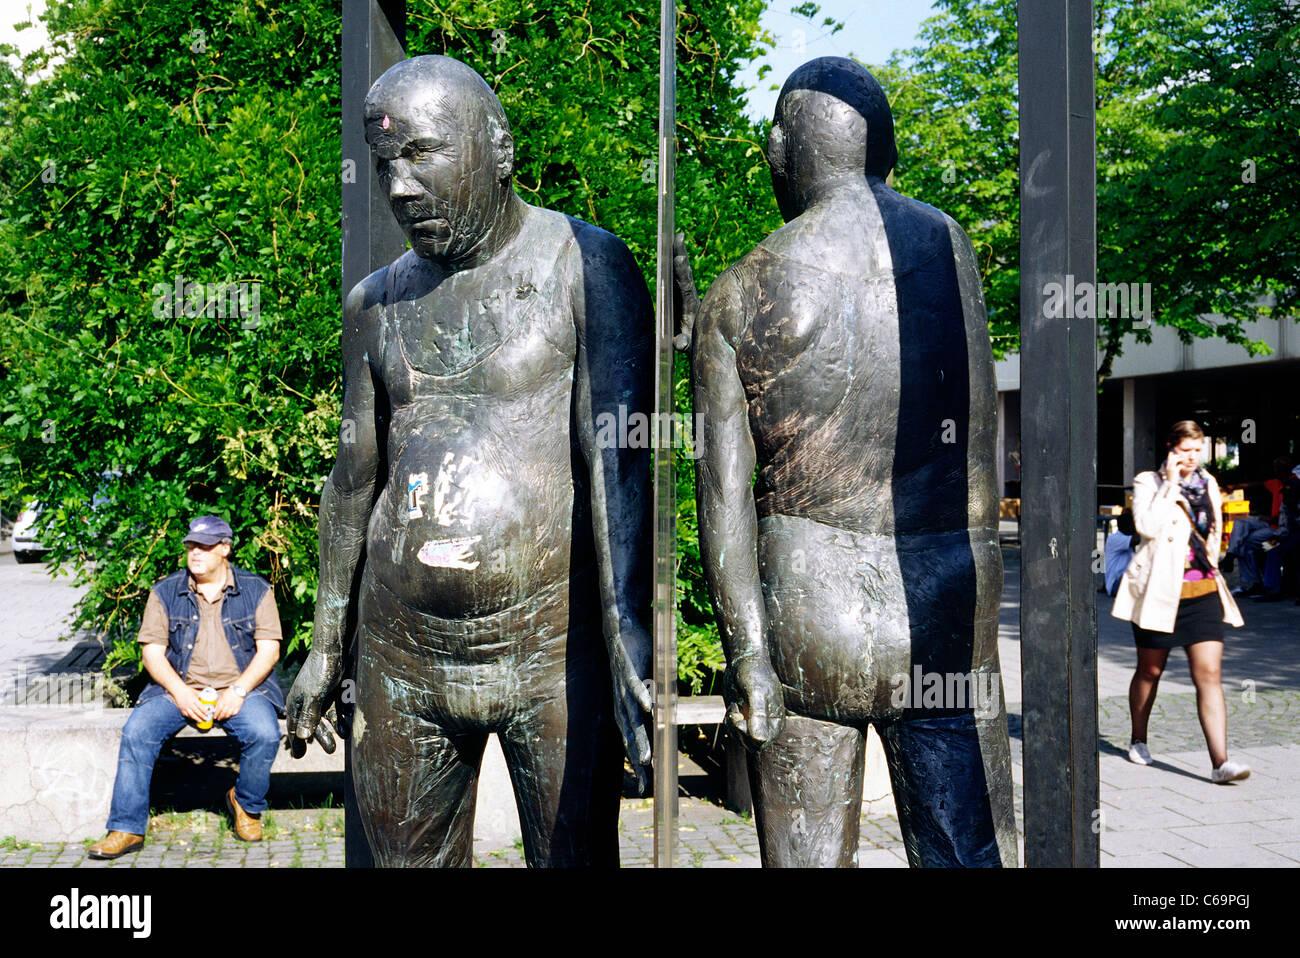 Bronze sculpture 'Mann in Drehtür' by Waldemar Otto (1986) in front of Goethe University at in Frankfurt - Stock Image